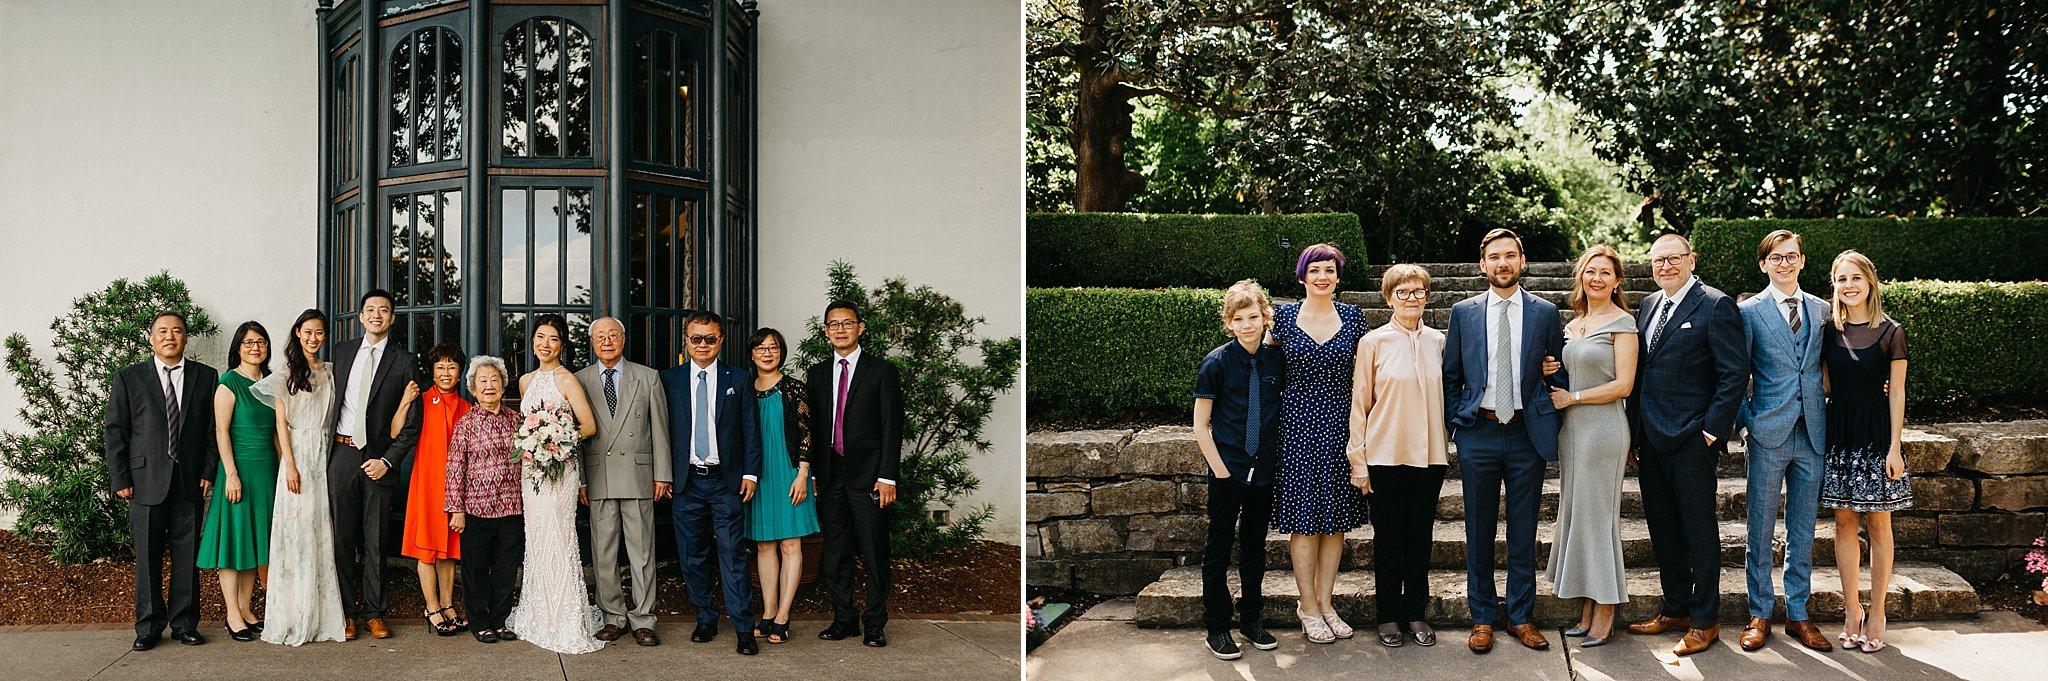 Wilderlove Co_Dallas Texas_Wedding Elopement_Arboretum_Photography_0025.jpg